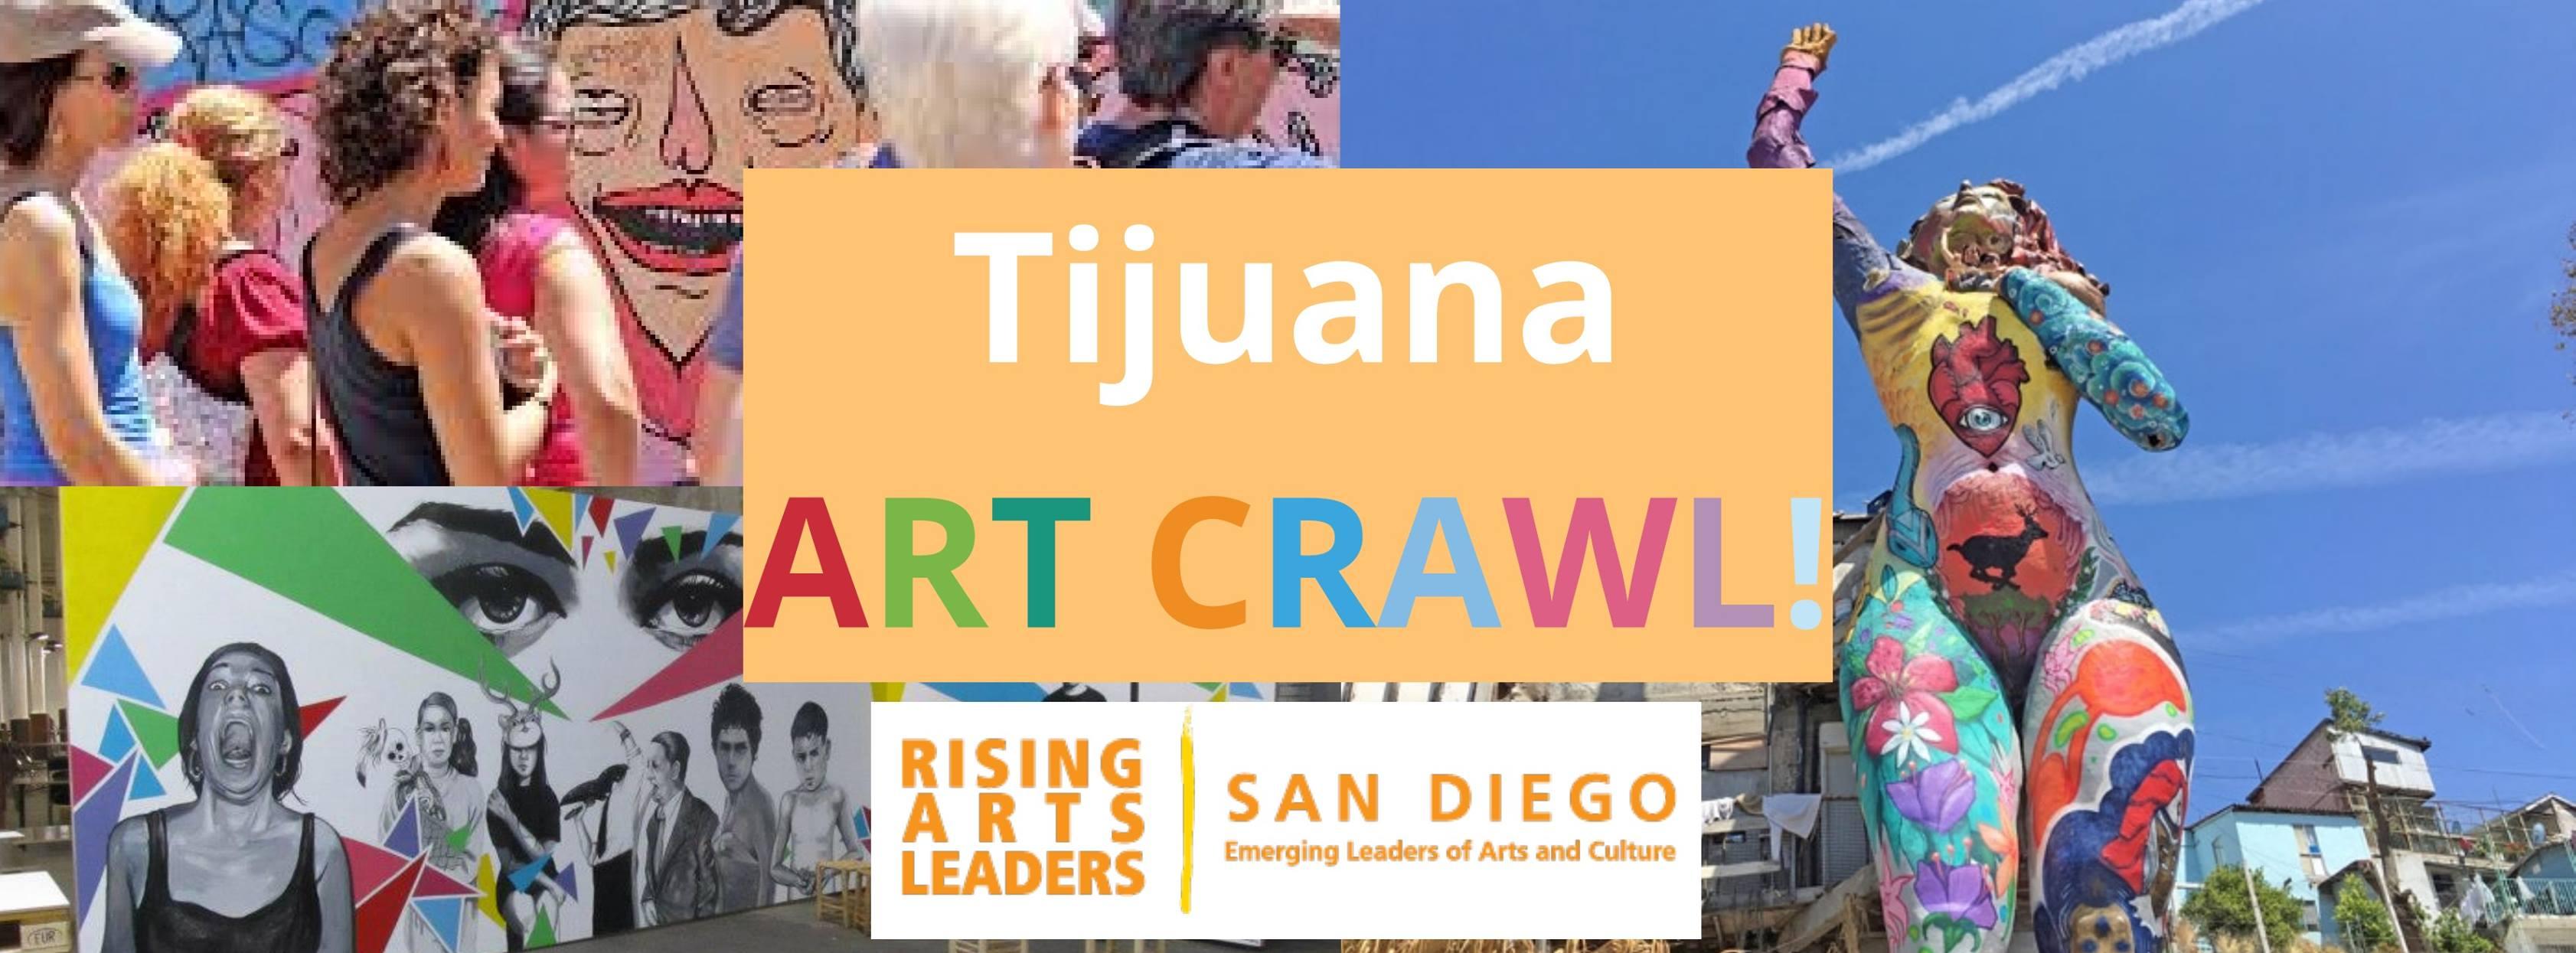 Rising Arts Leaders TJ Art Crawl